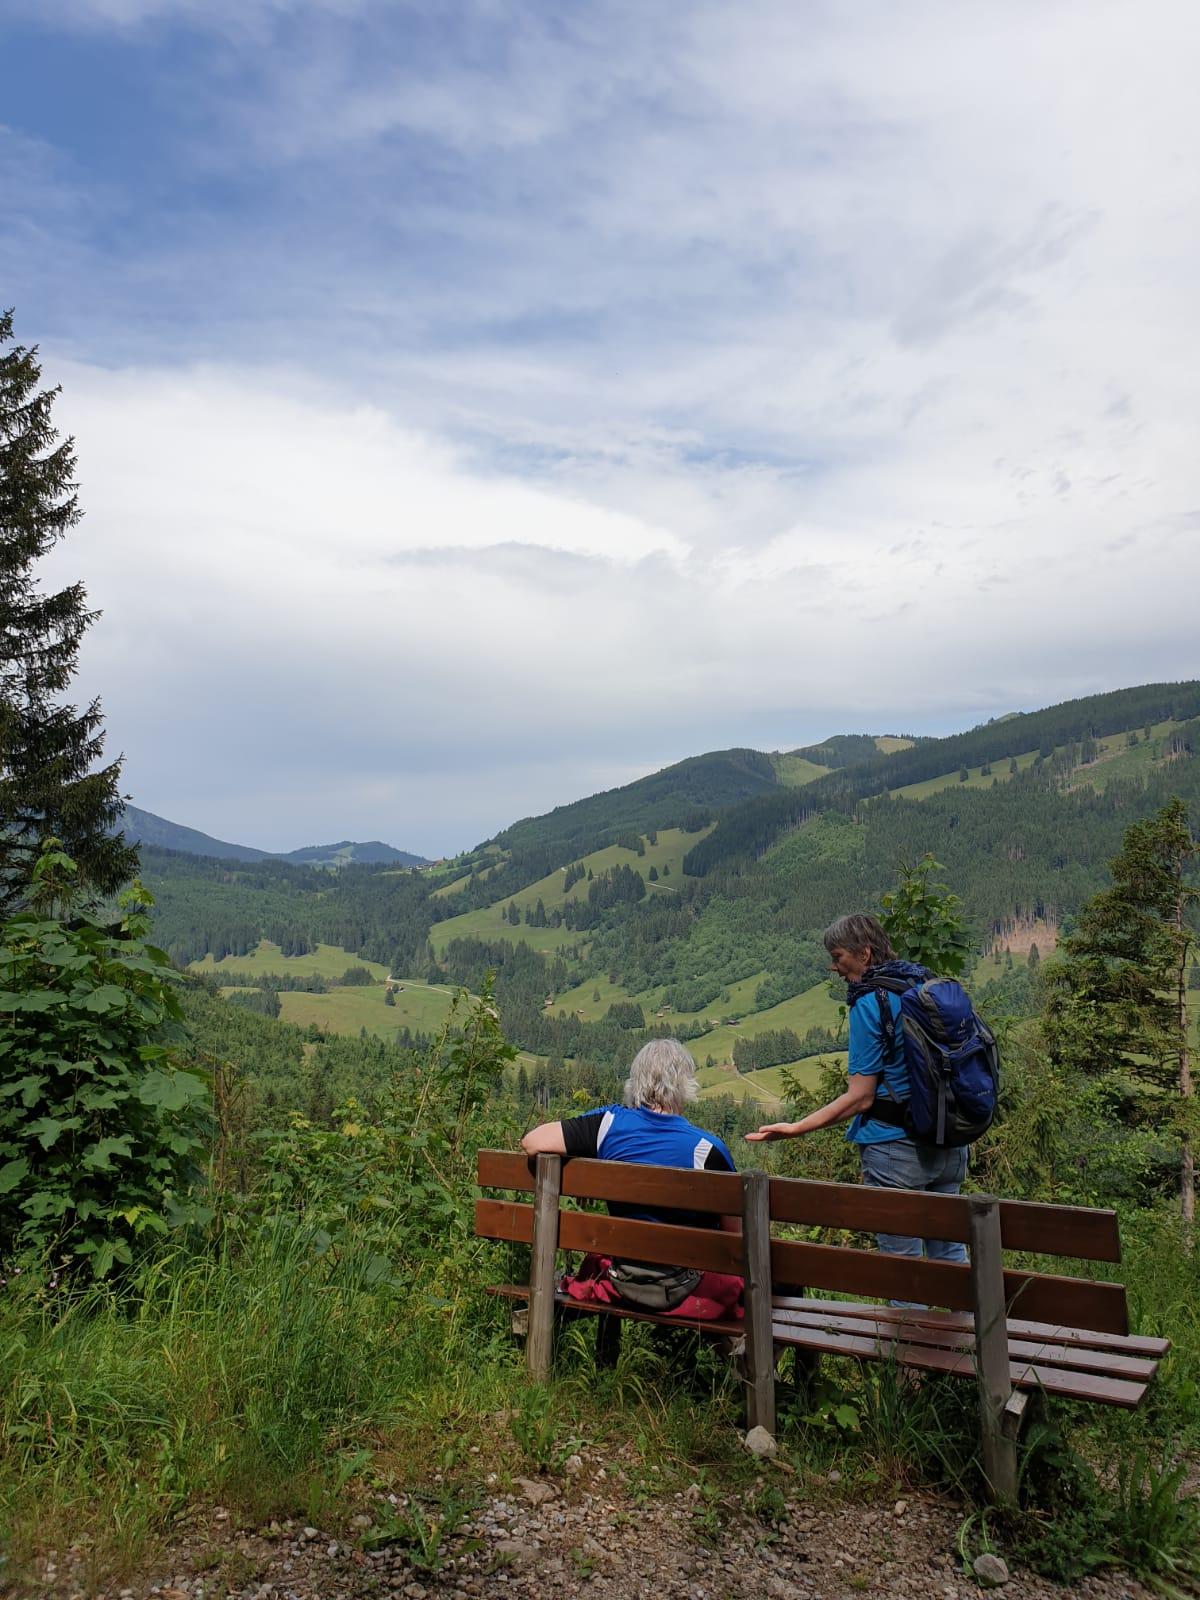 rt-iseevens-barenmoosalpe-pfronten-allgau-bayern-wandelbankjes-https-t-co-azhygr5tet